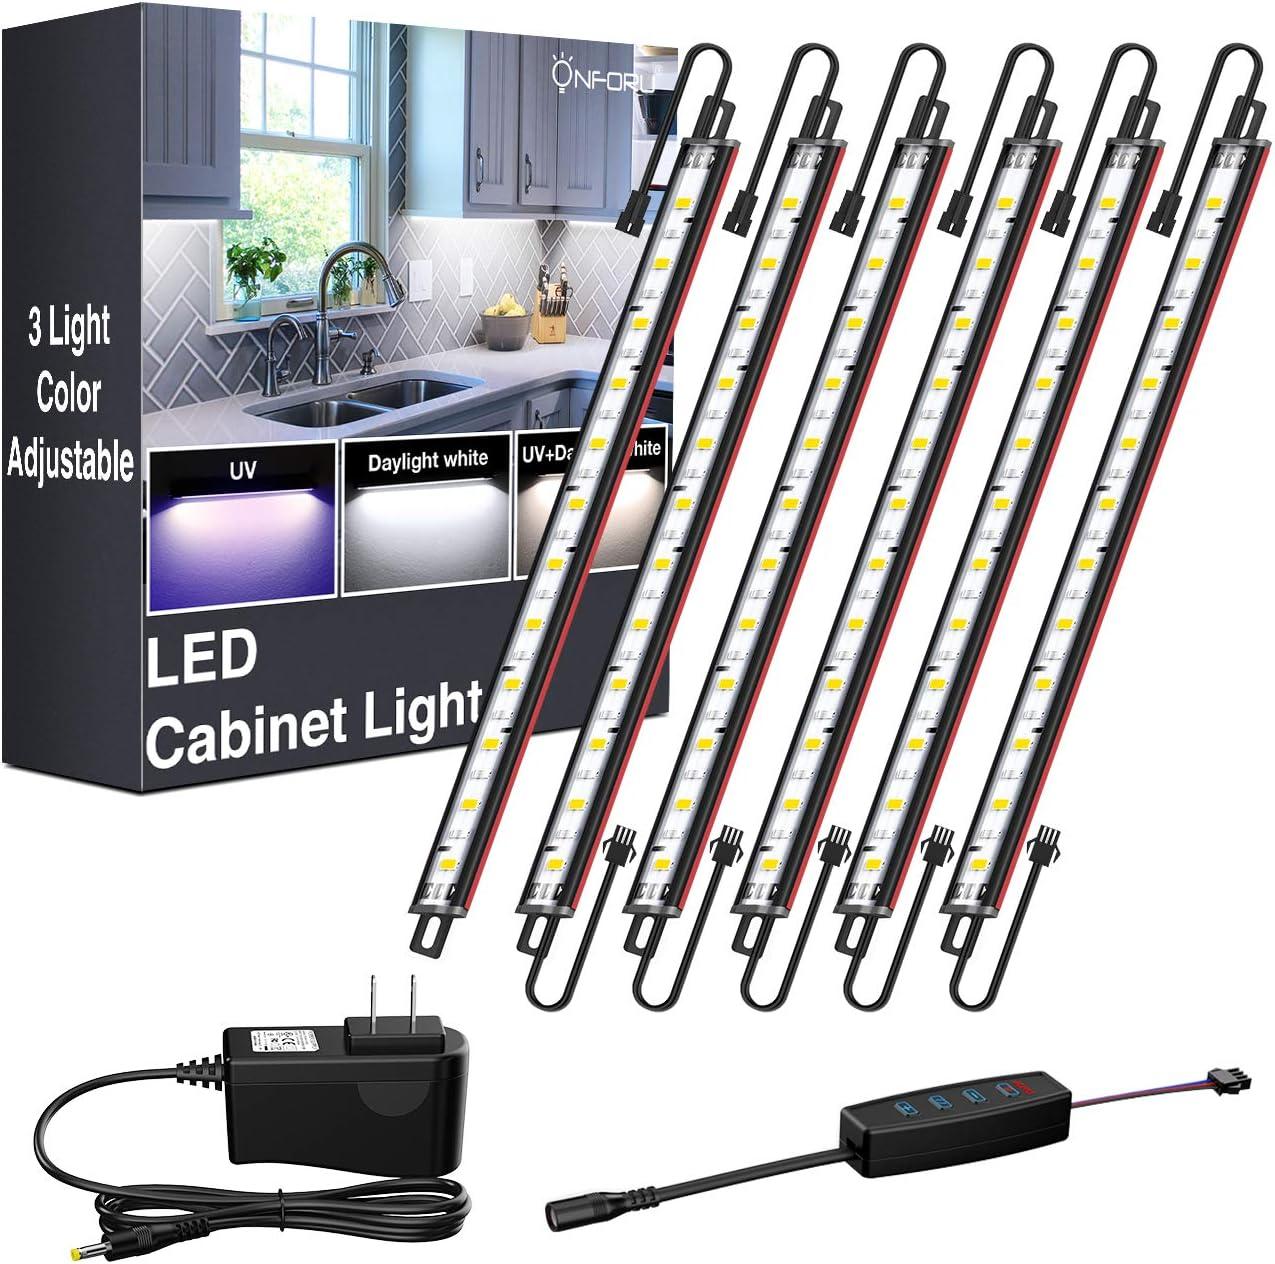 Onforu LED Under Cabinet Lights Kit, 3 Colors Adjustable, 1080LM Dimmable Puck Lights, Cool White, UV Black Light Under Counter Light, 12V Blacklight Closet Lighting for Kitchen, Showcase, 6 PCS